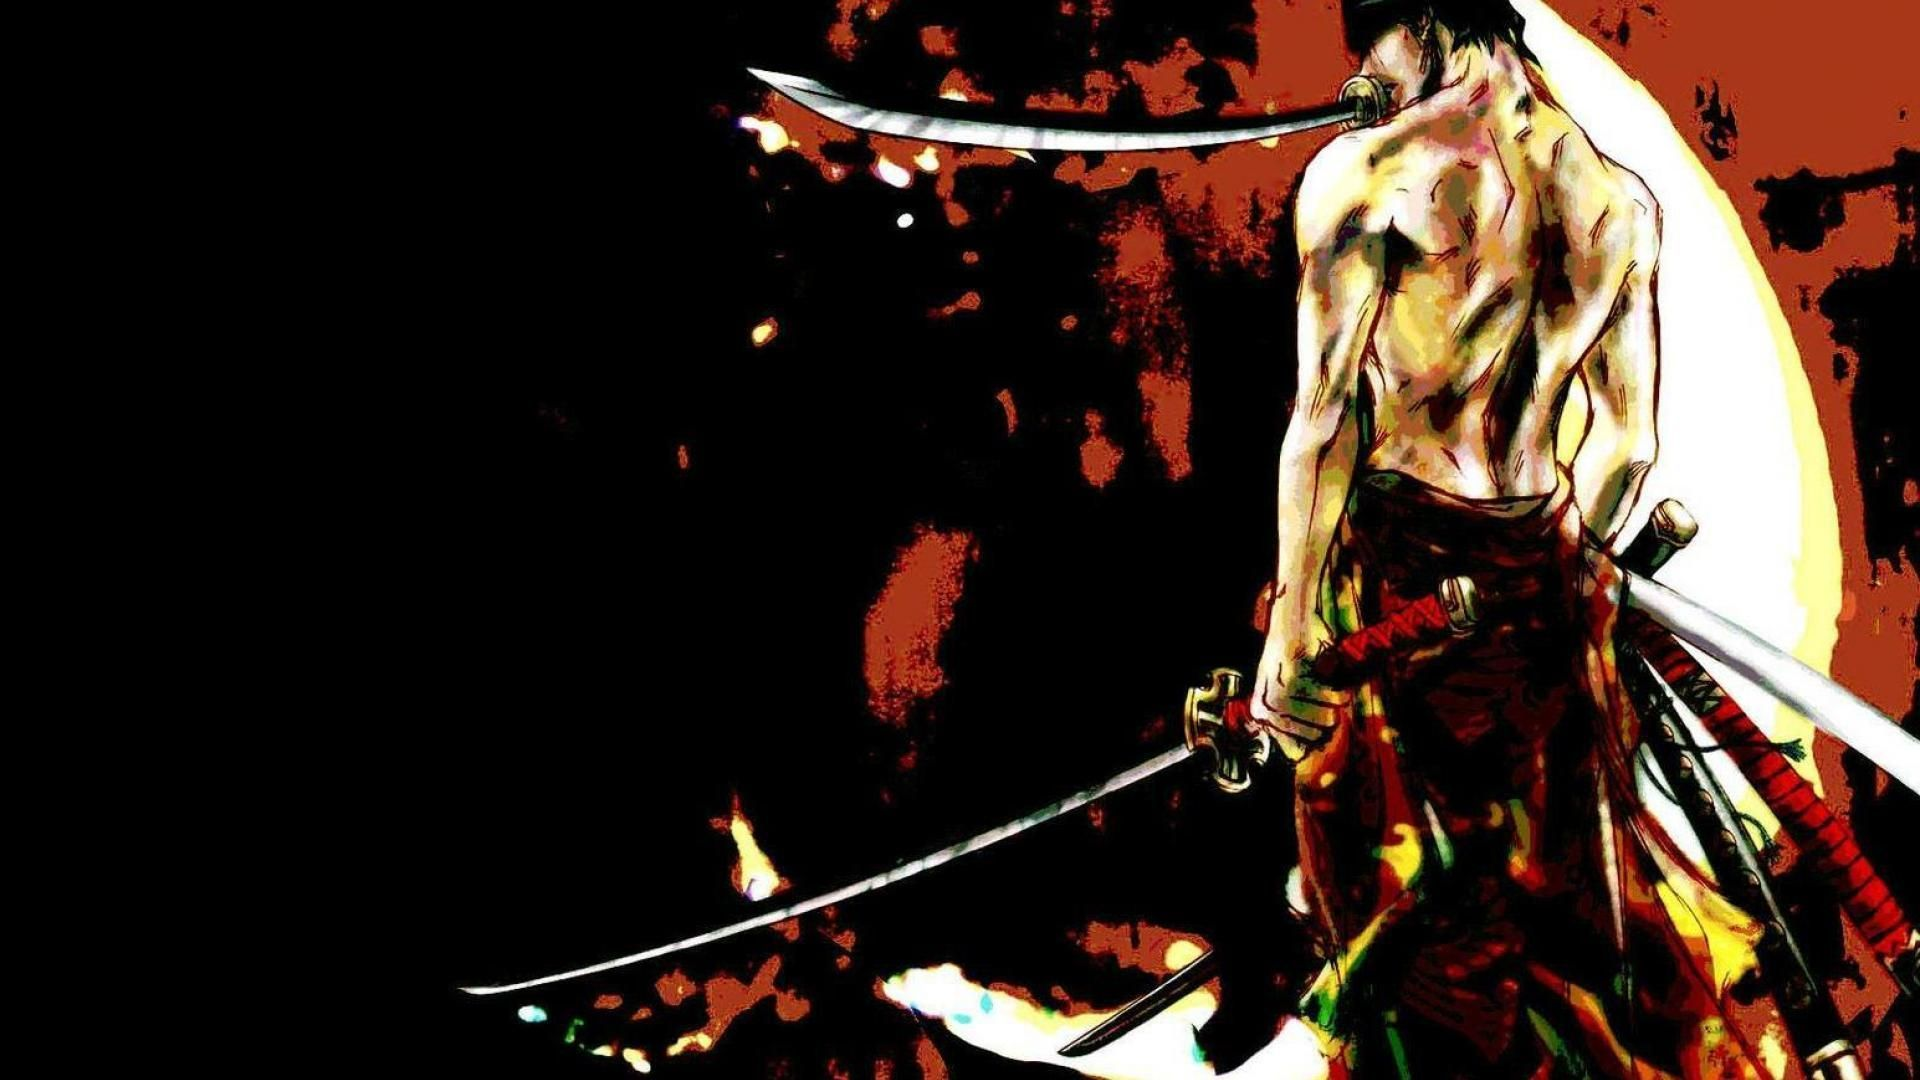 Roronoa Zoro Wallpapers Top Free Roronoa Zoro Backgrounds Wallpaperaccess